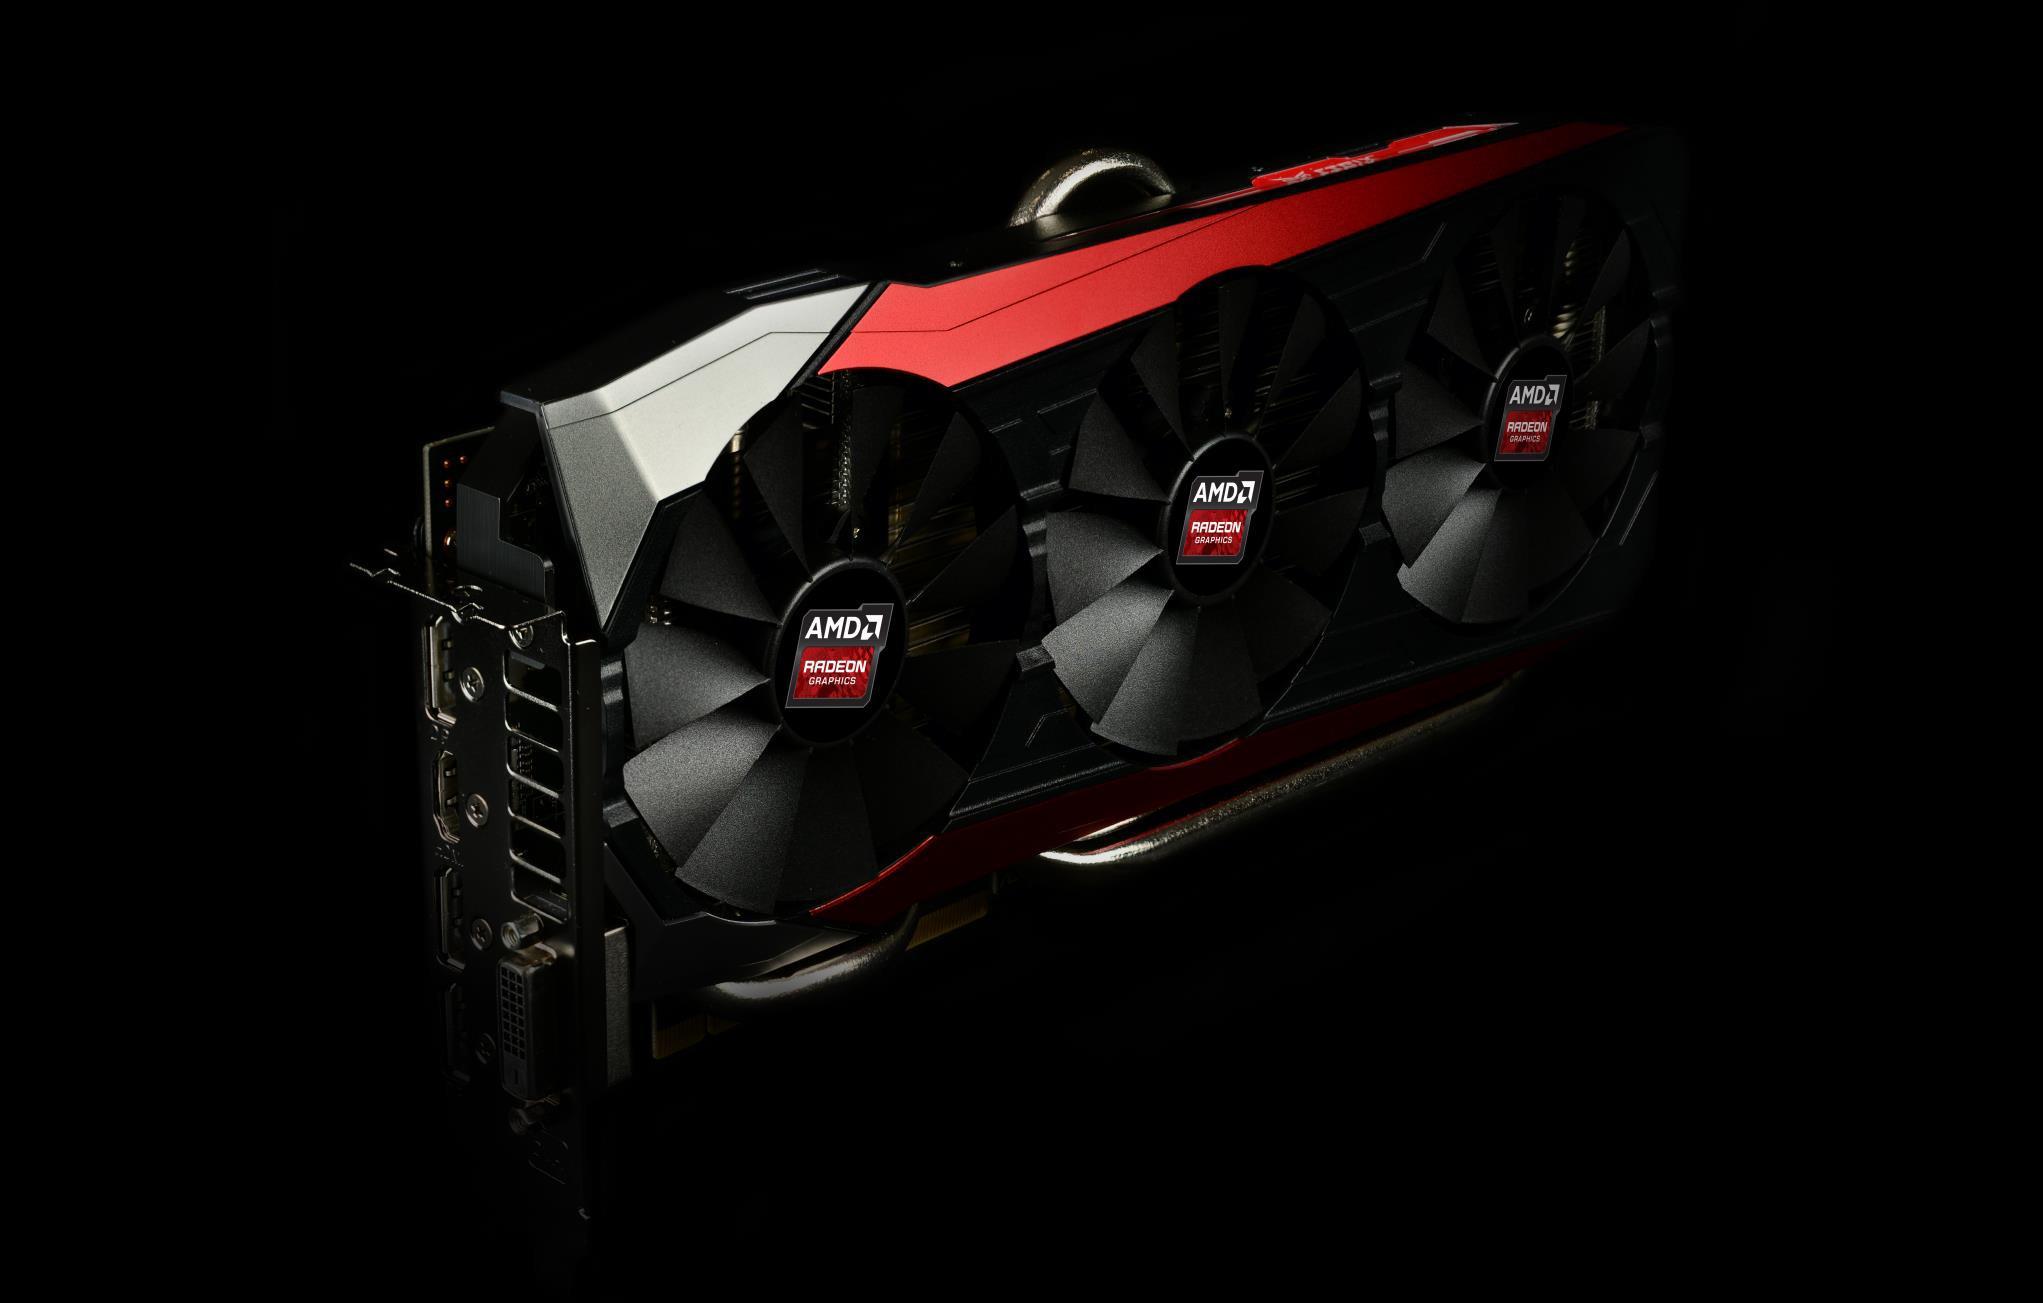 Asus sitt STRIX Radeon R9 Fury-skjermkort med dyrt HBM-minne.